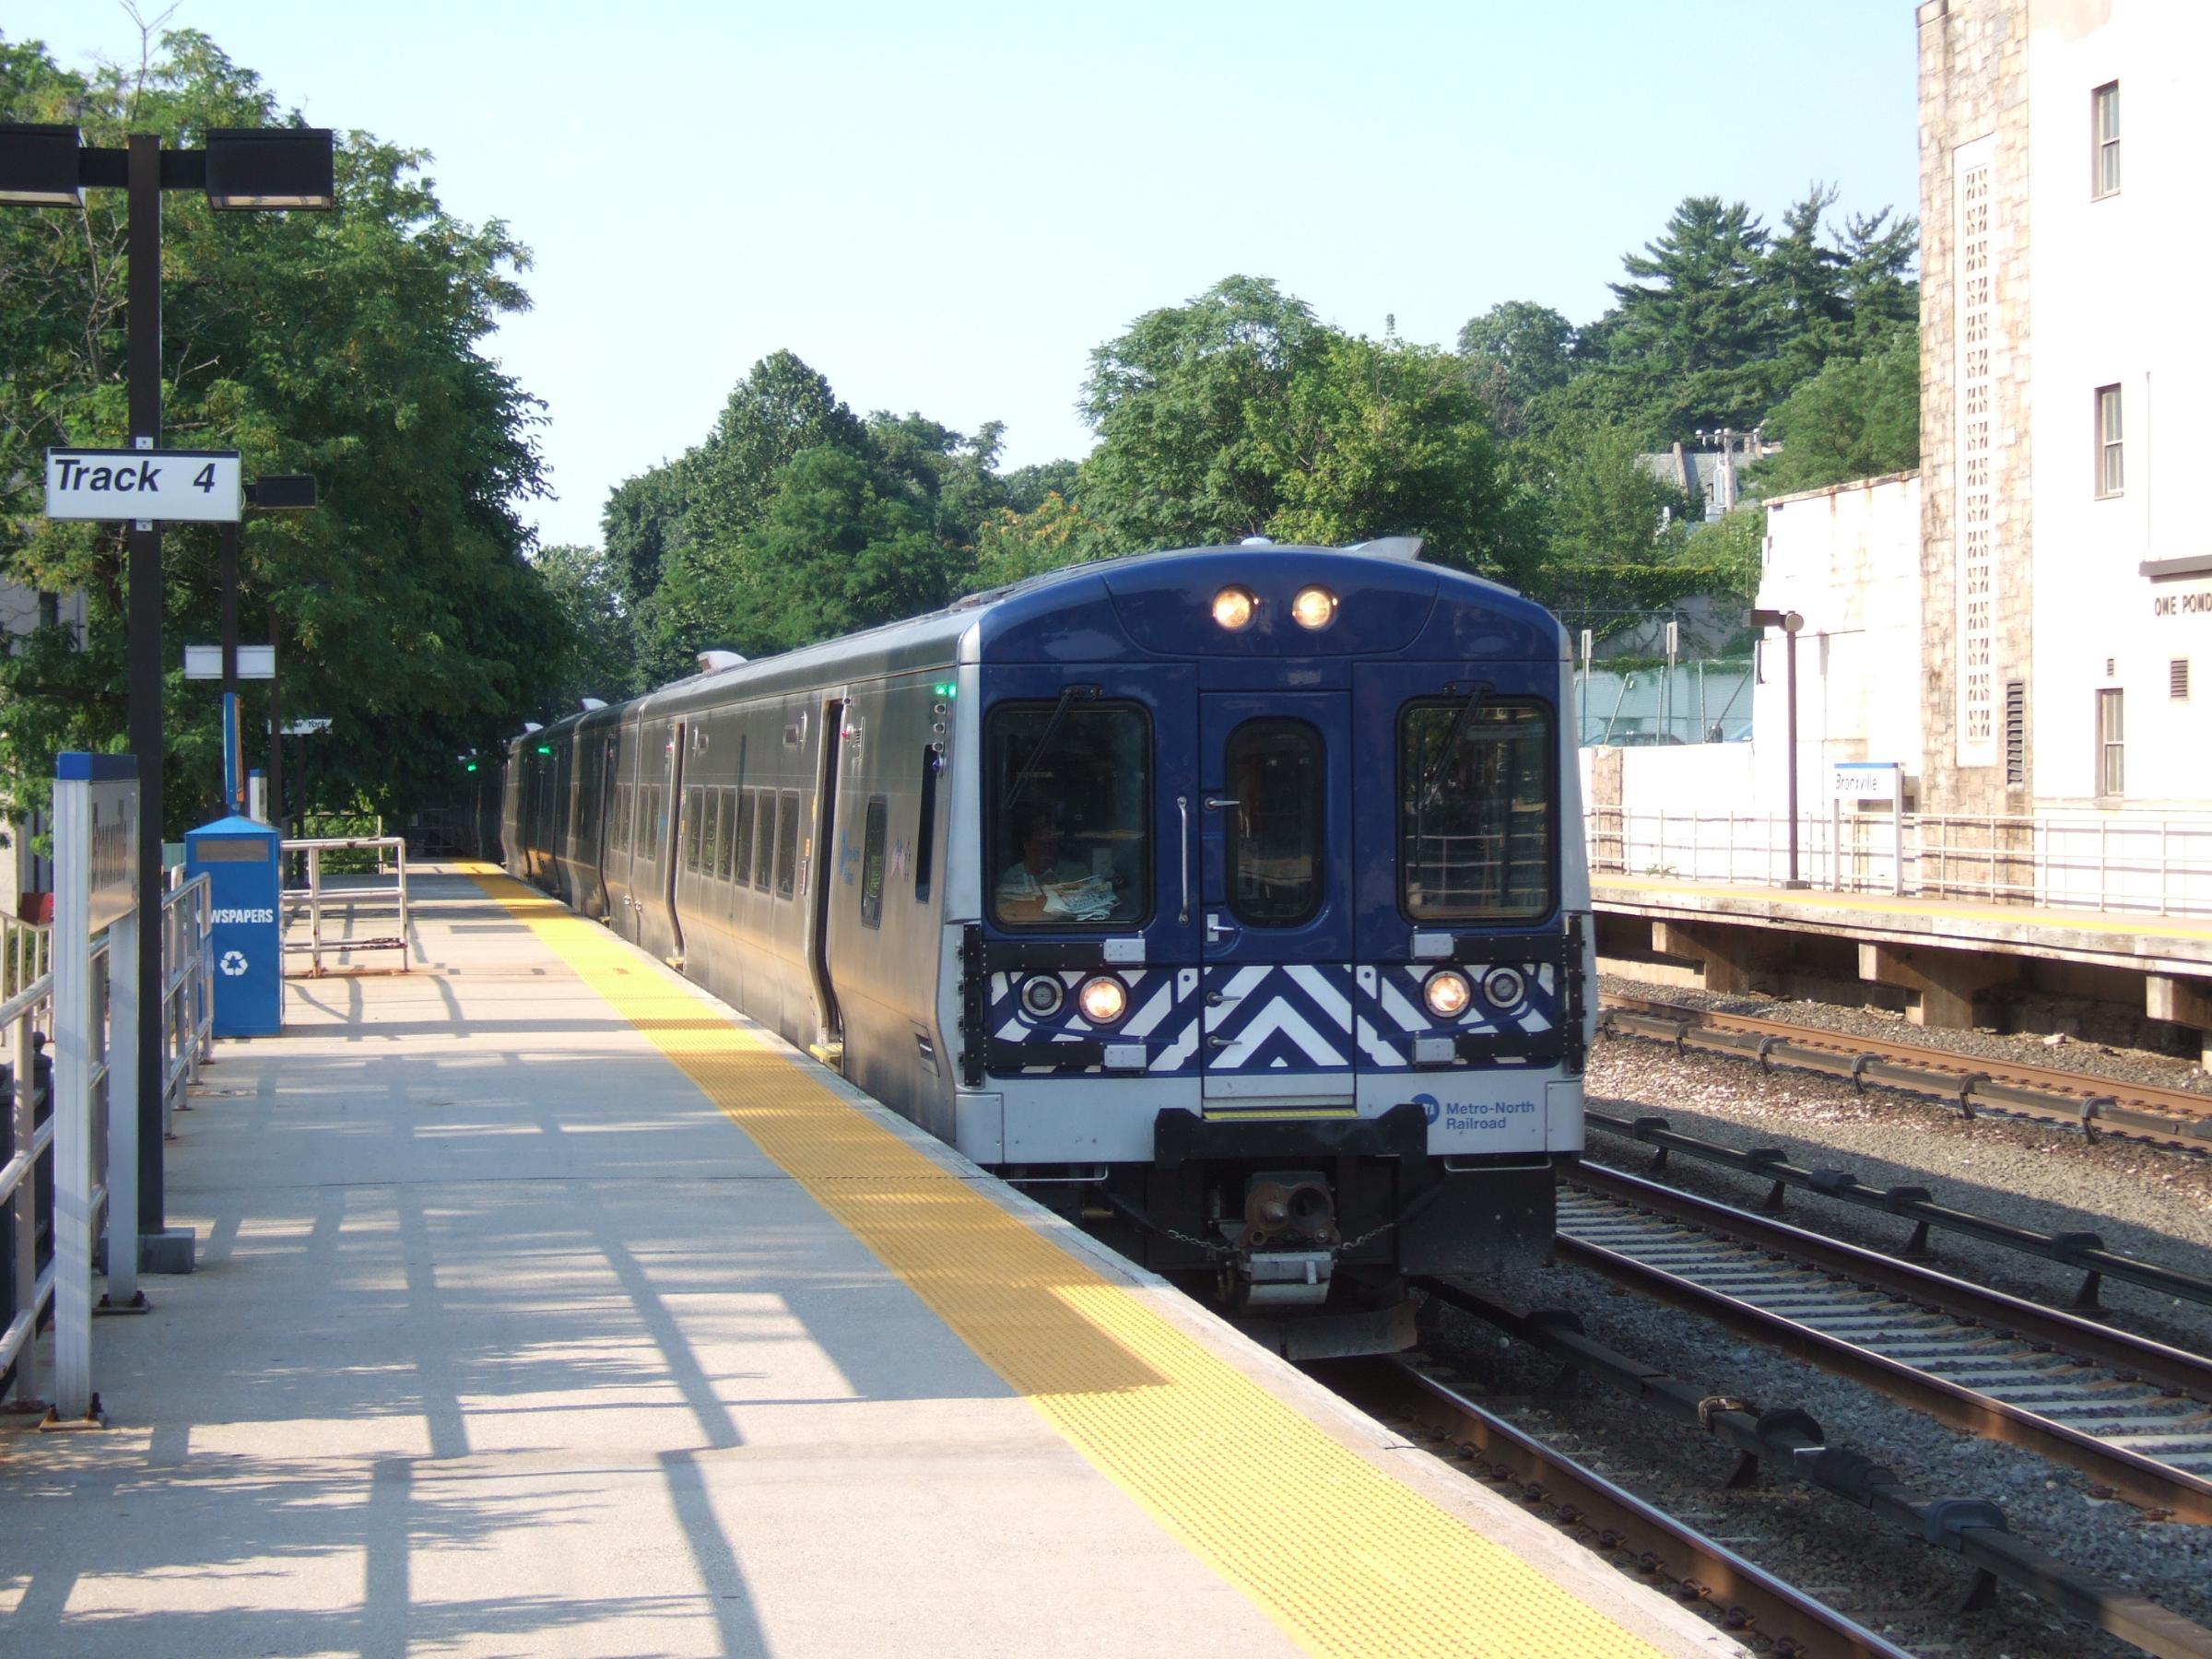 Metro North train